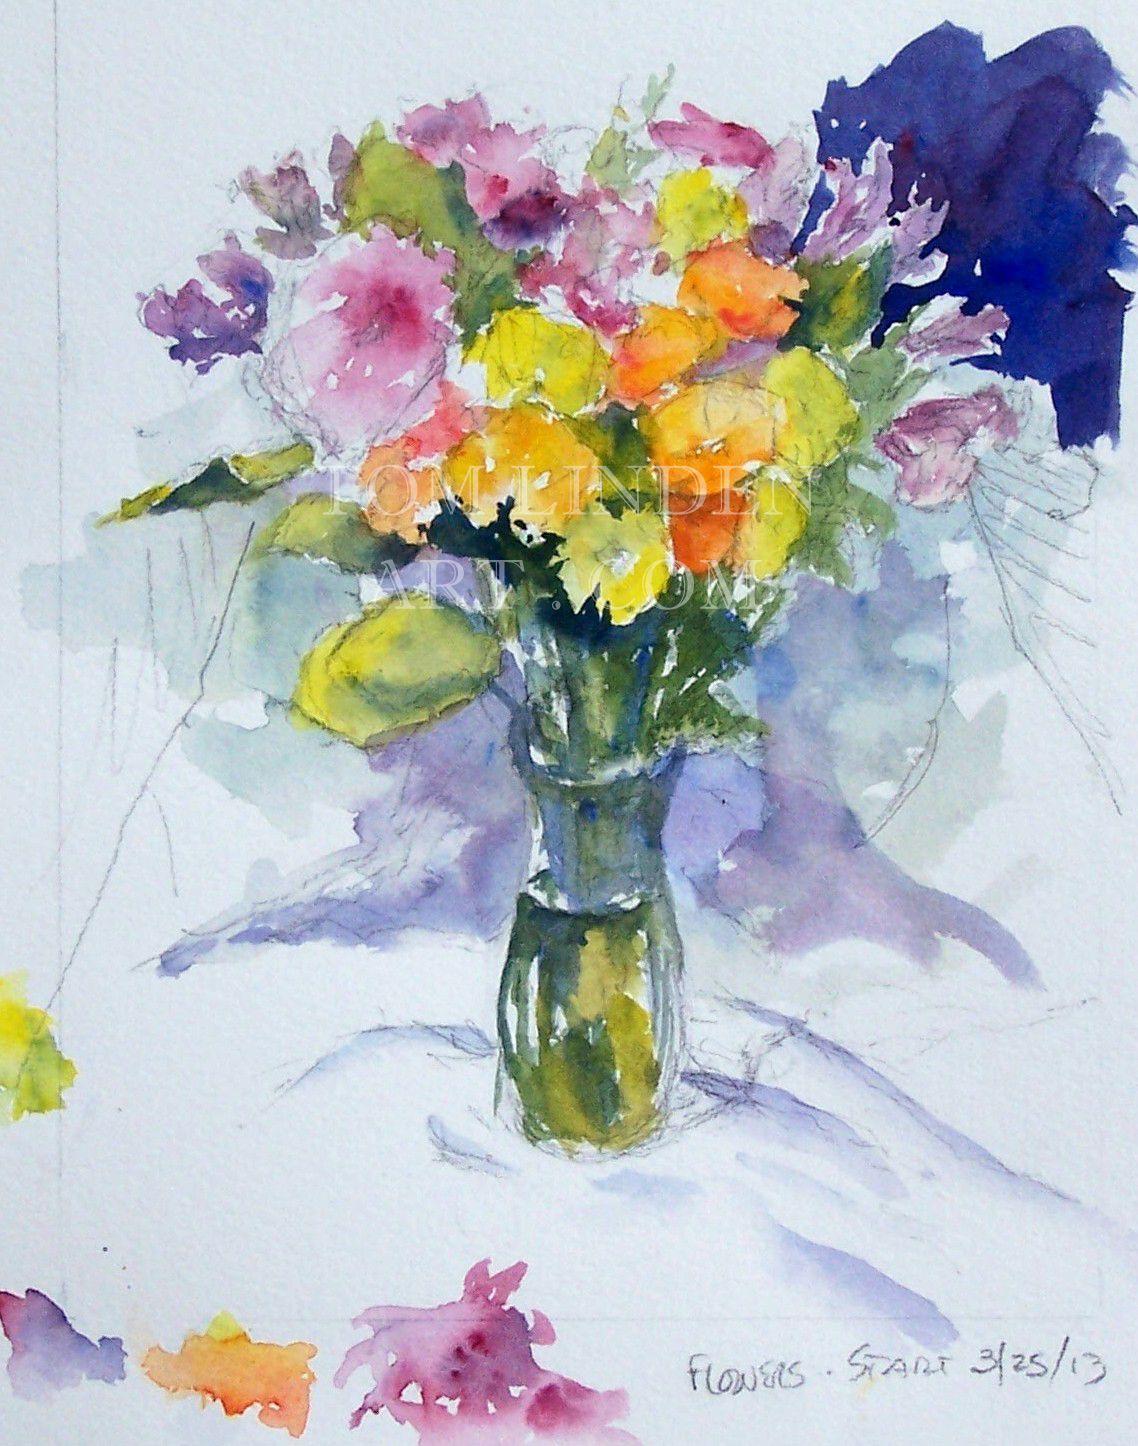 Watercolor paintings of flowers flower bouquet artwatercolor watercolor paintings of flowers flower bouquet izmirmasajfo Choice Image